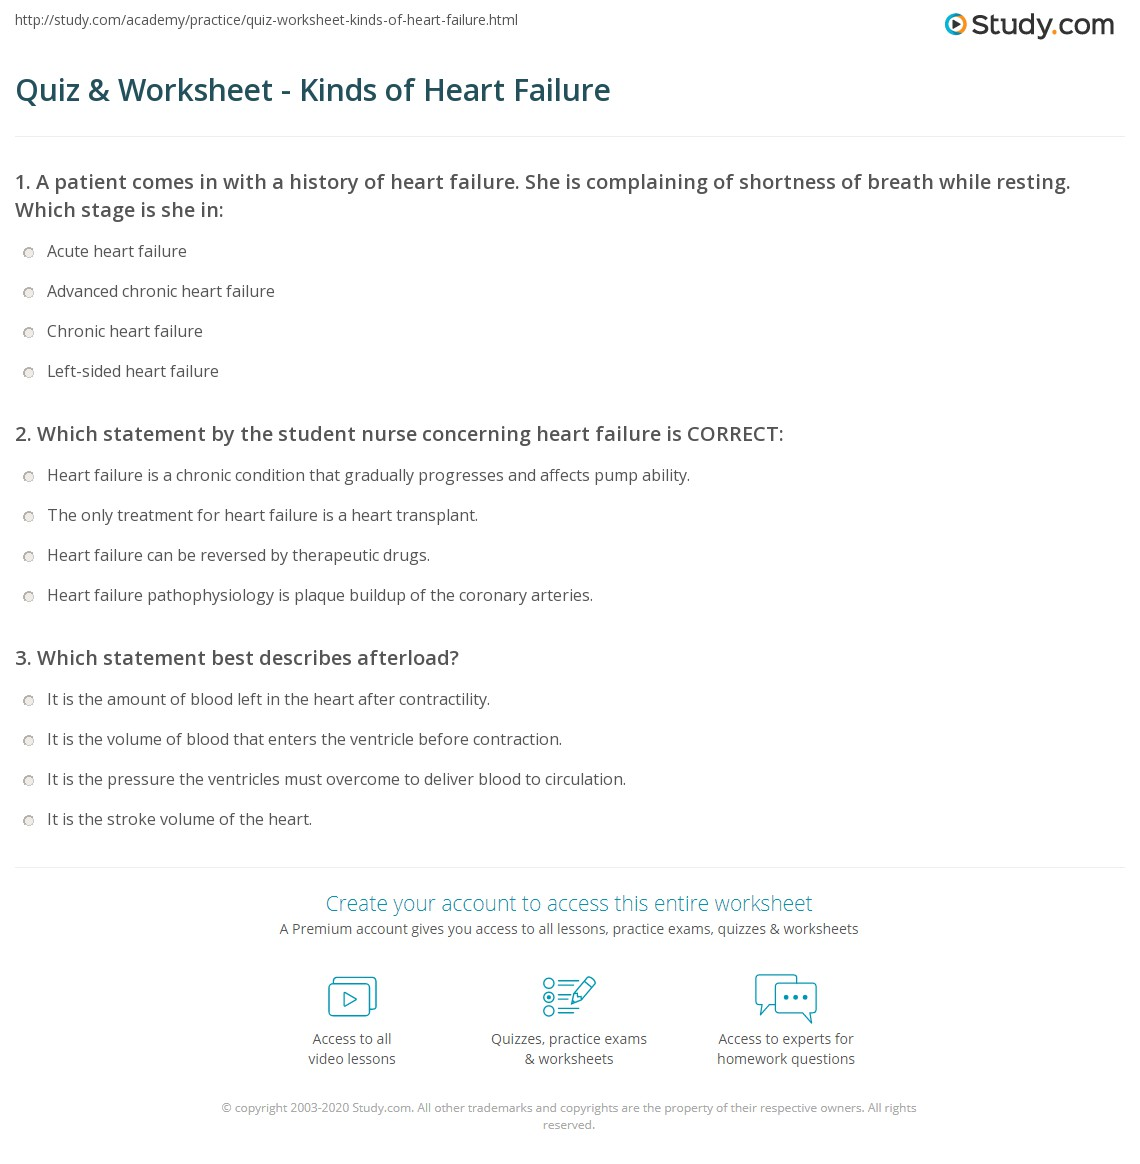 Quiz & Worksheet - Kinds of Heart Failure | Study.com